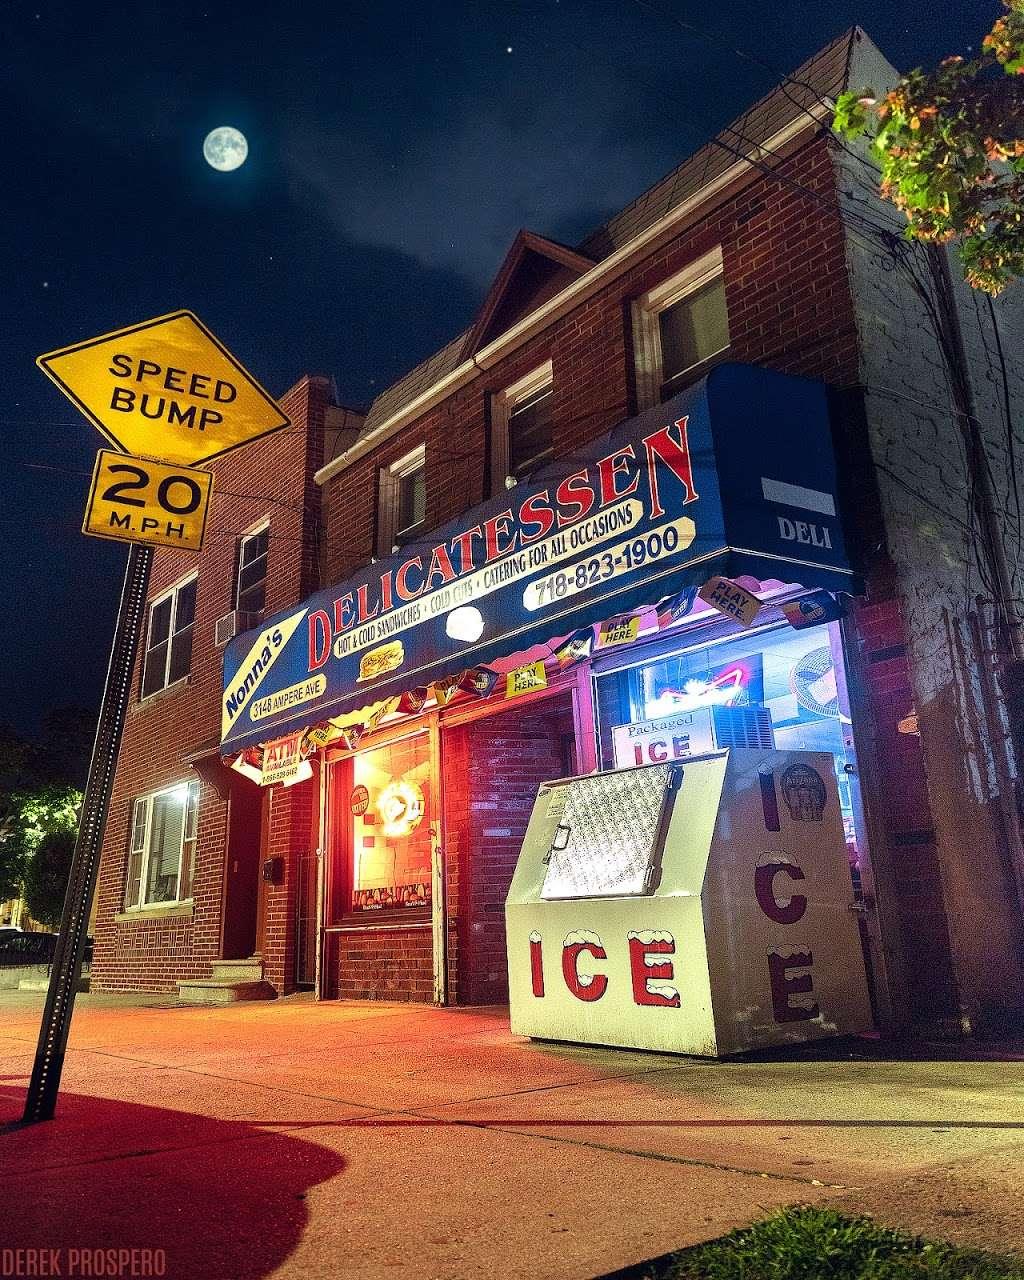 Nonnas - restaurant  | Photo 1 of 1 | Address: 3148 Ampere Ave, Bronx, NY 10465, USA | Phone: (718) 823-1900